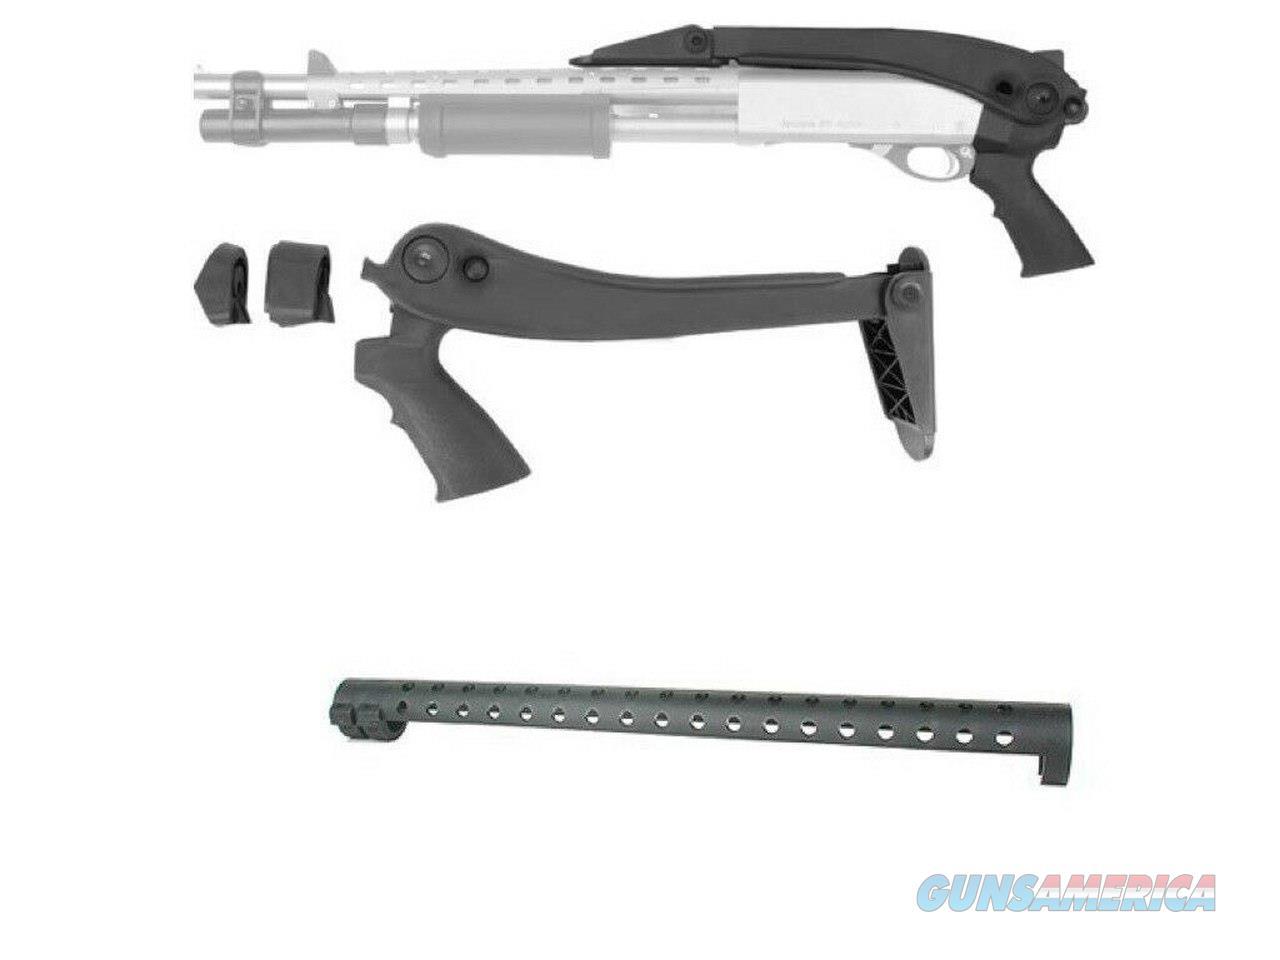 ATI Pistol Grip TOP FOLDING Stock Pistol Grip Heat Shield Remington 870 Shotgun !!  Non-Guns > Ammunition